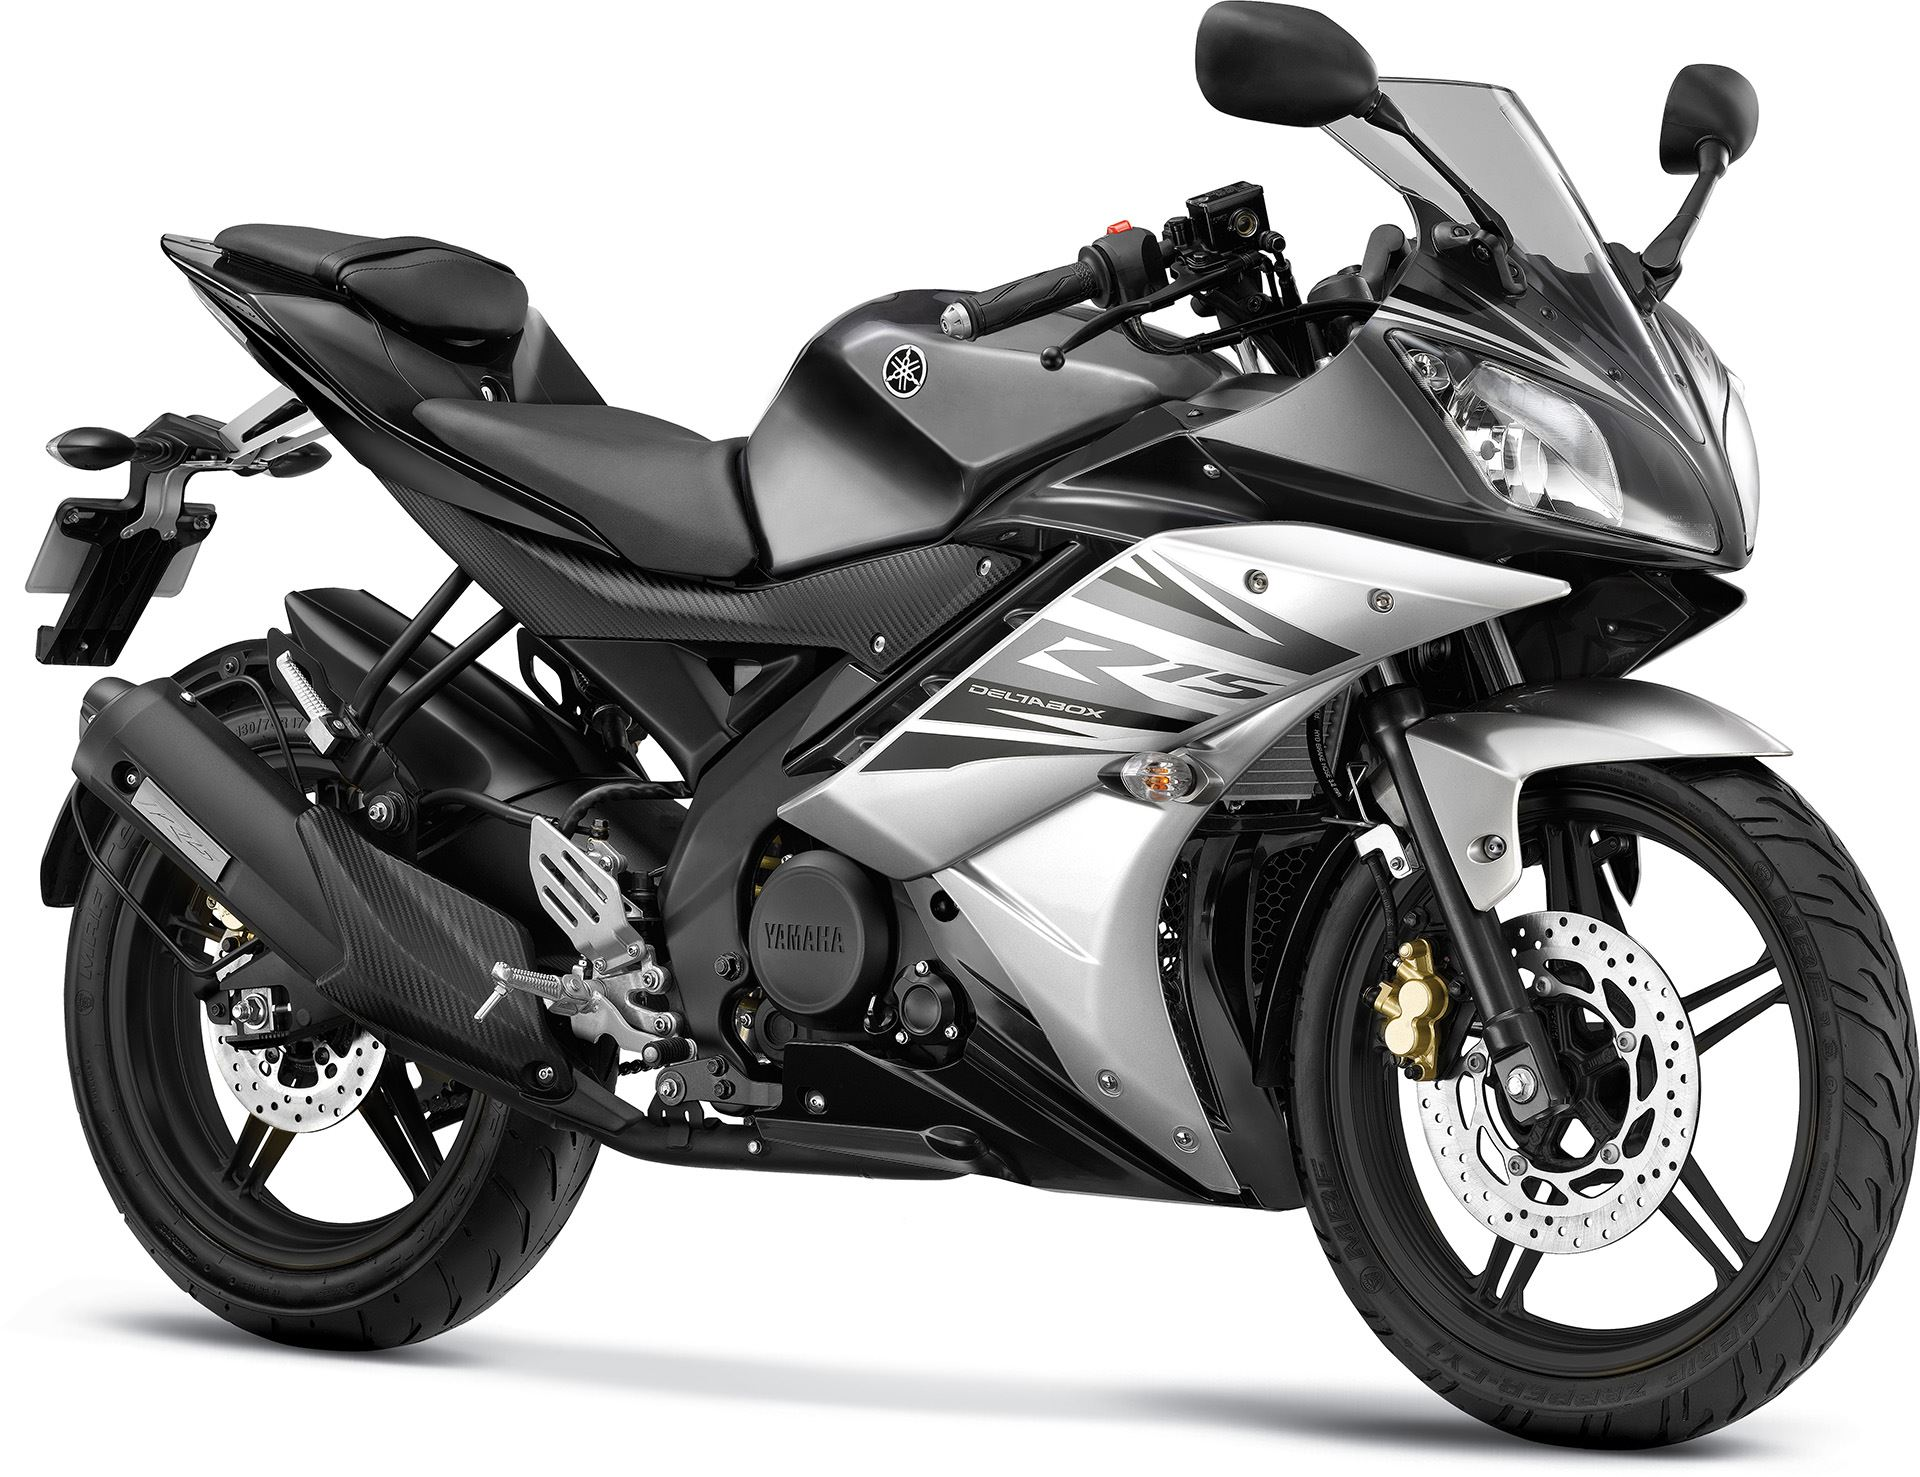 2014 Yamaha YZF-R15 colour Invincible Black